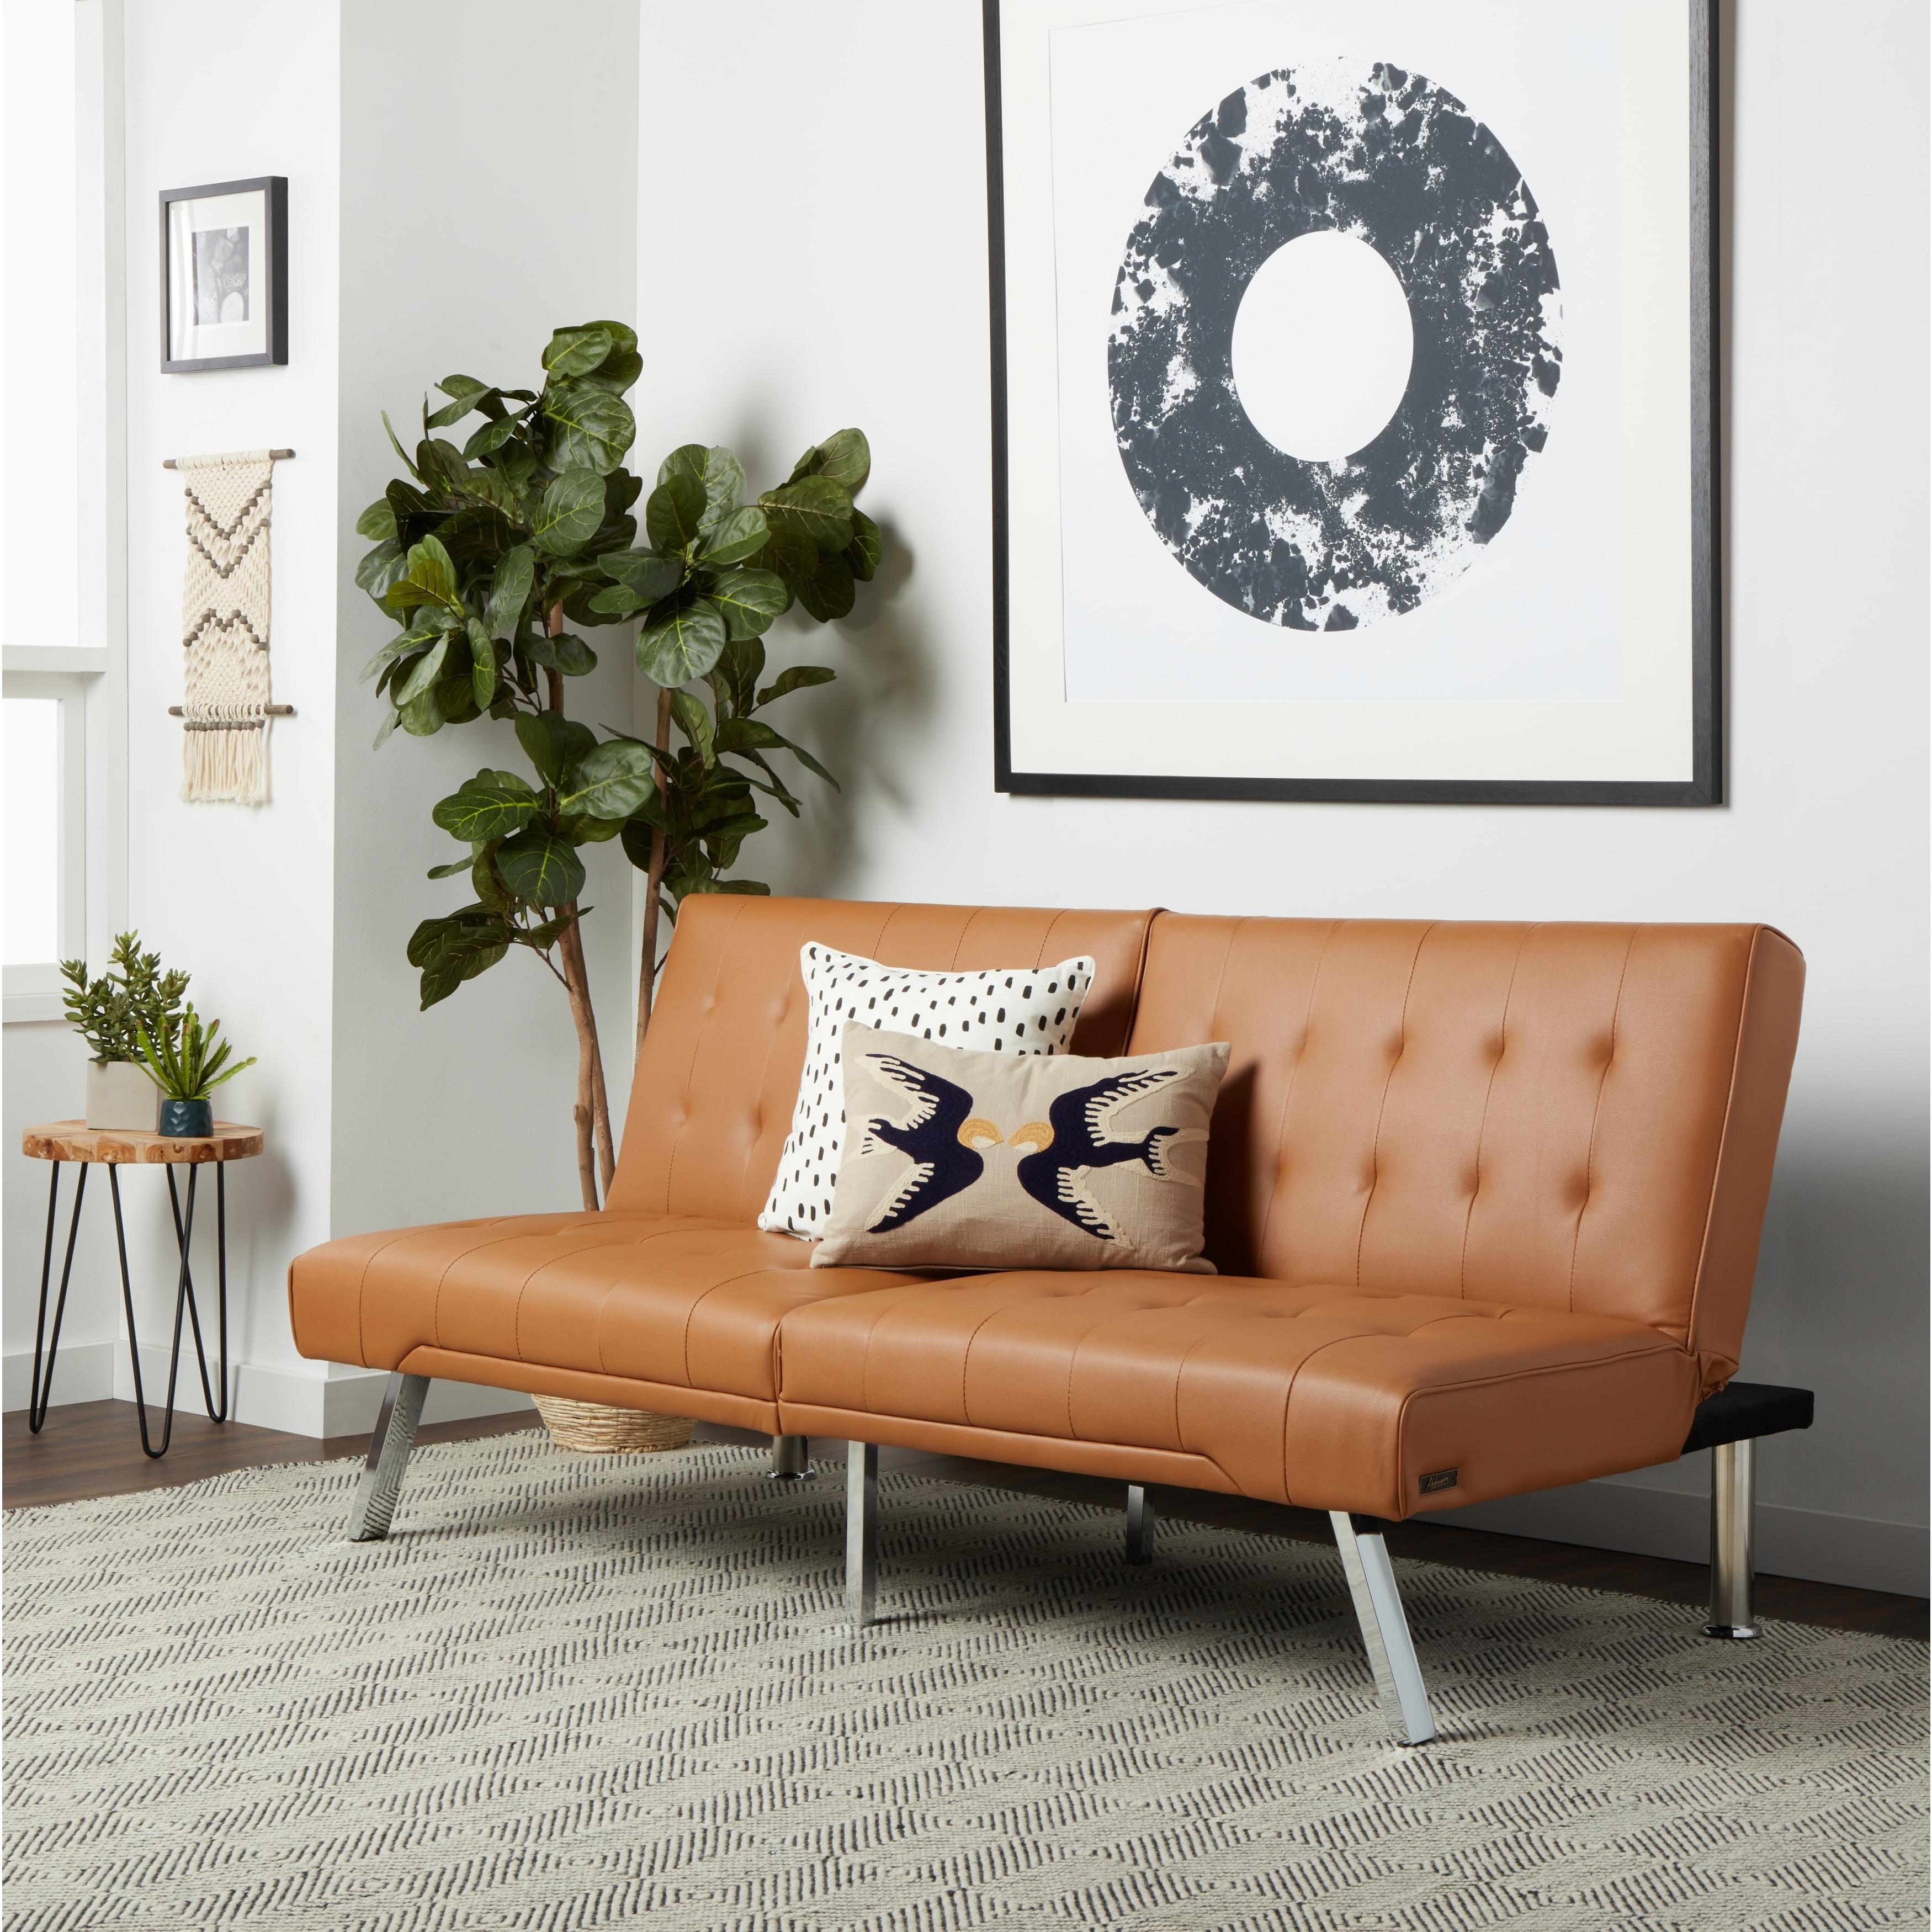 Camel Leather Foldable Futon Sofa Bed